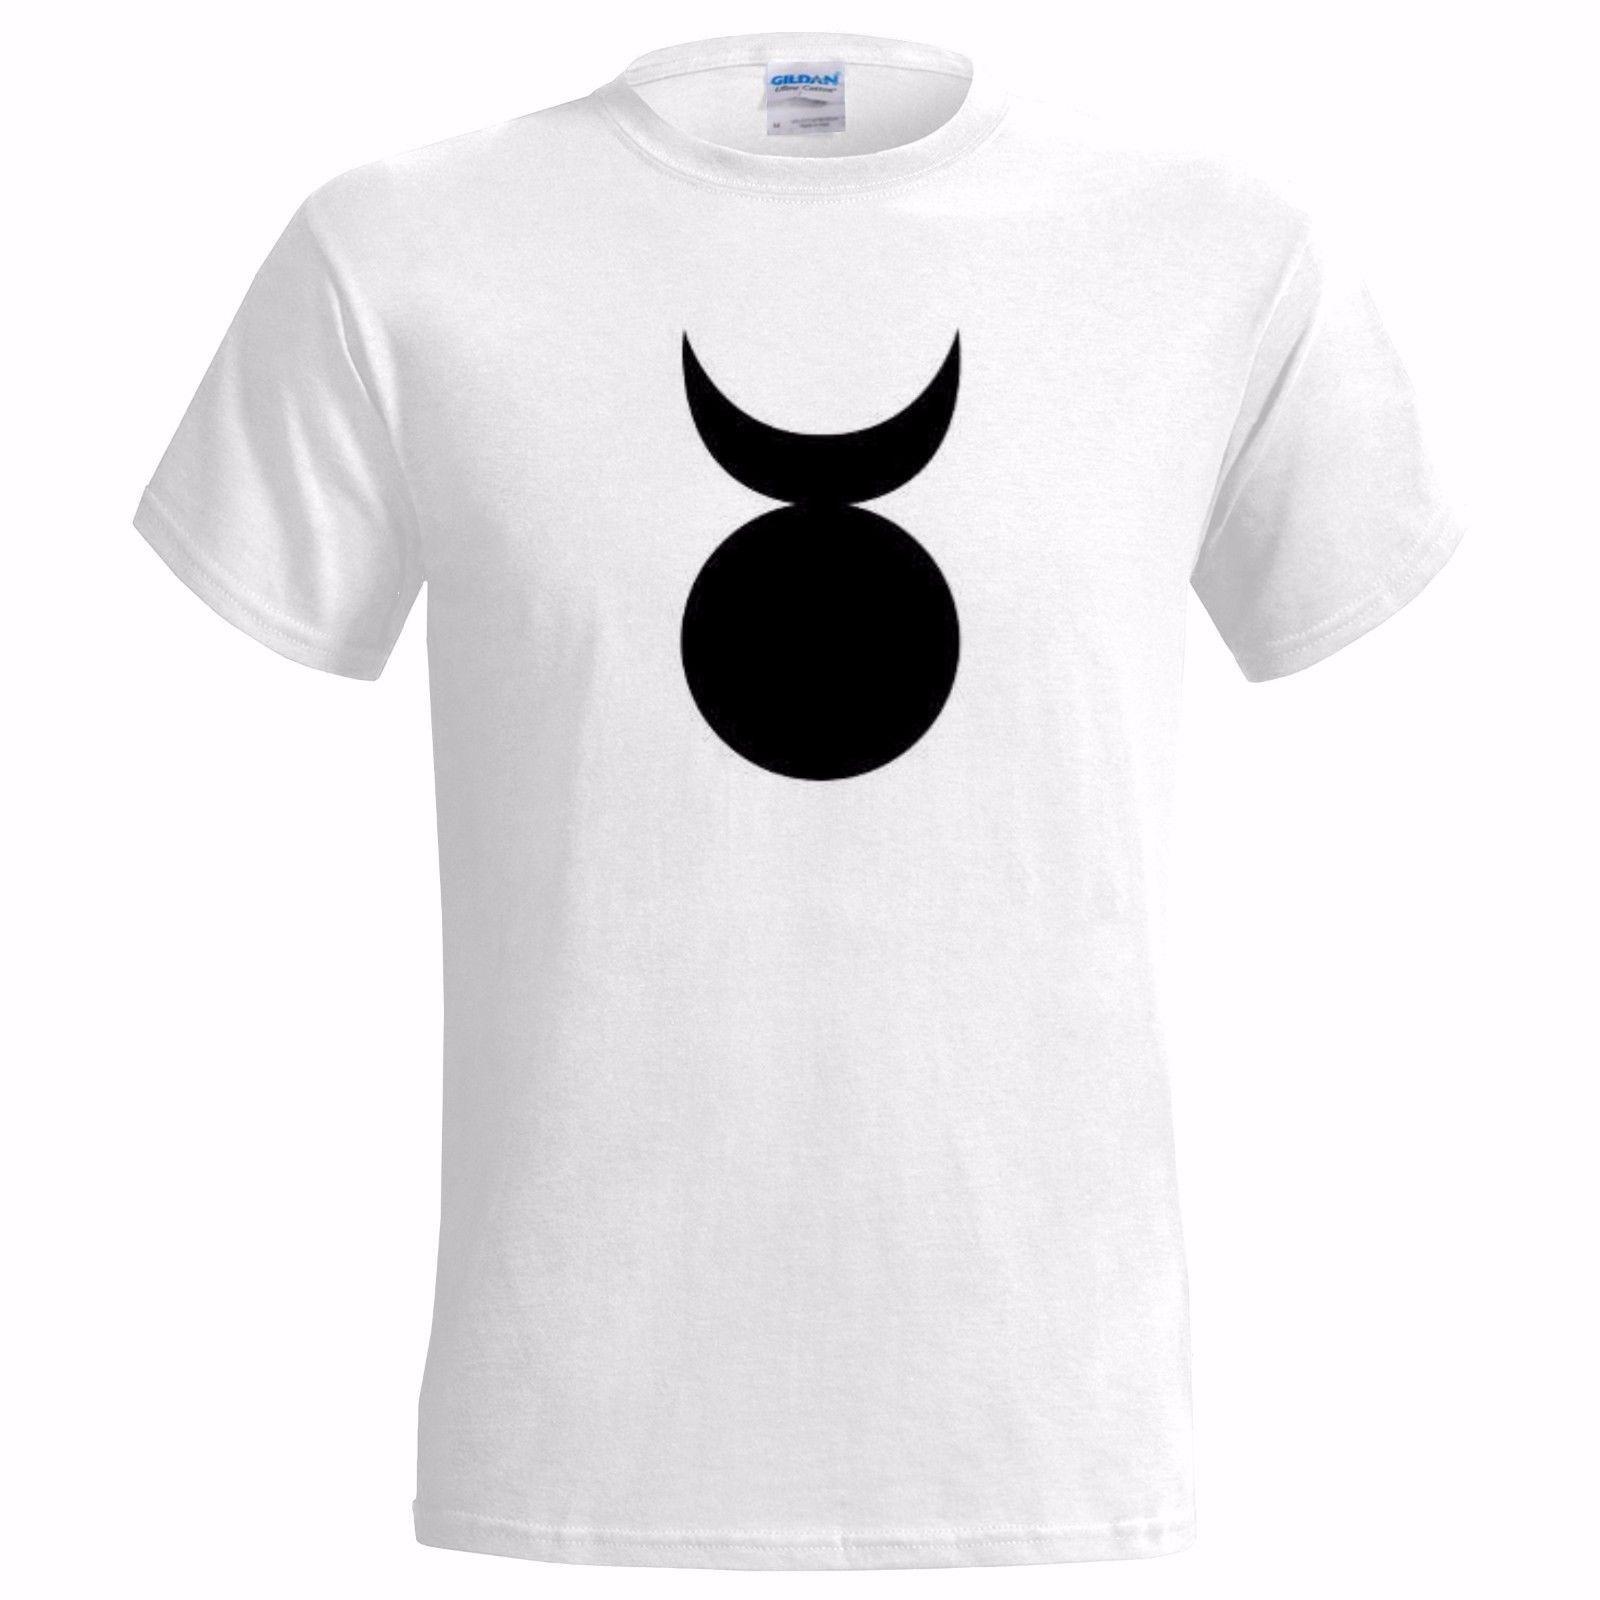 Grosshandel Horned God Symbol Mens T Shirt Wicca Wiccan Pagan Zeichen